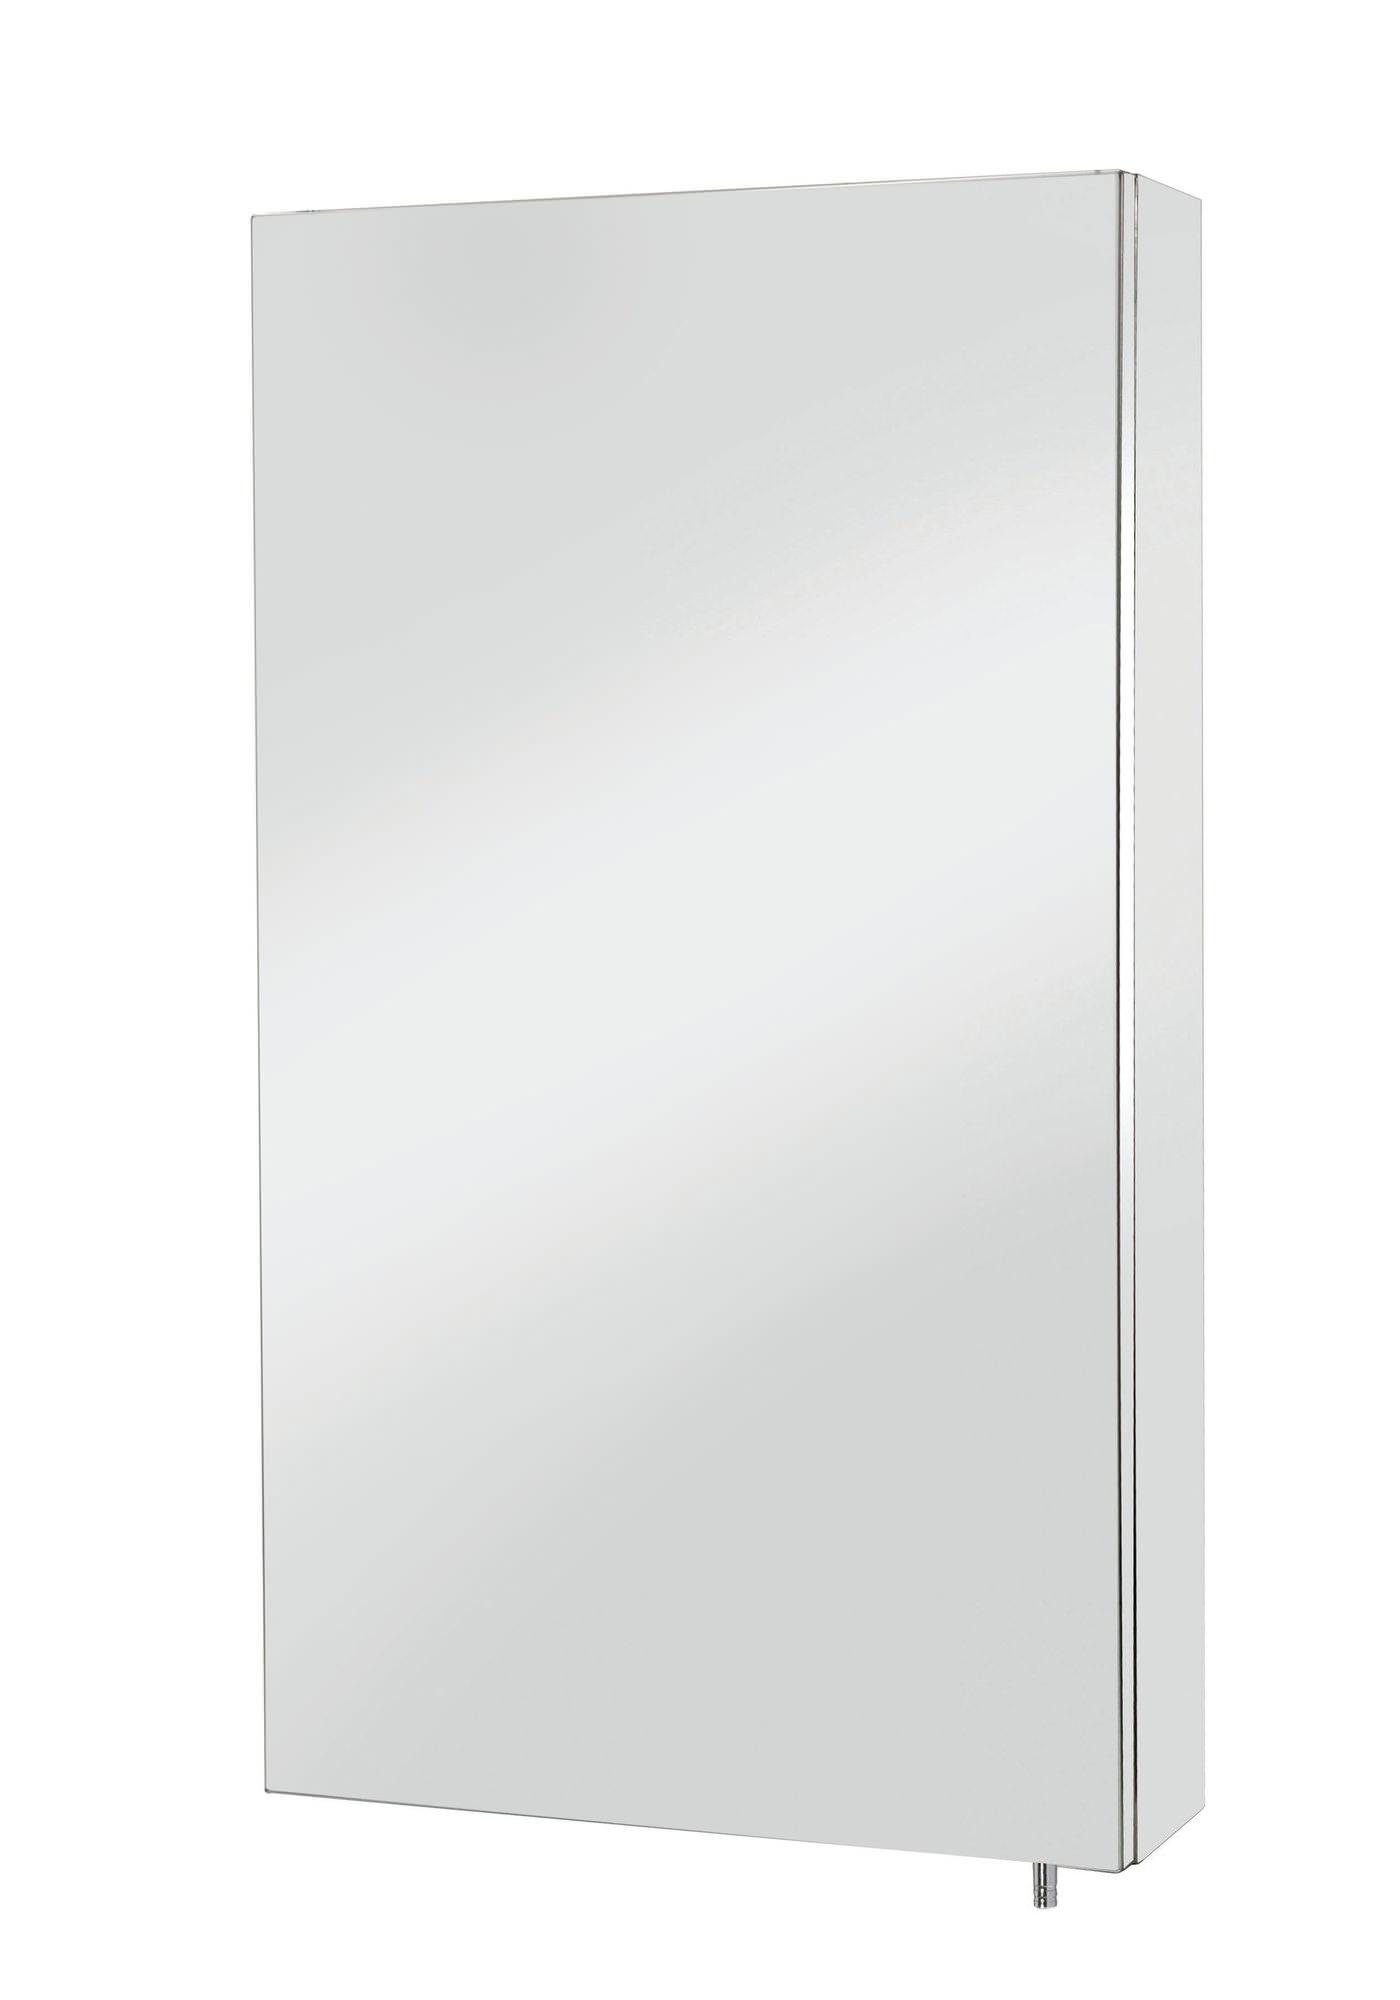 Croydex colorado stainless steel single door large mirror for Large door mirror